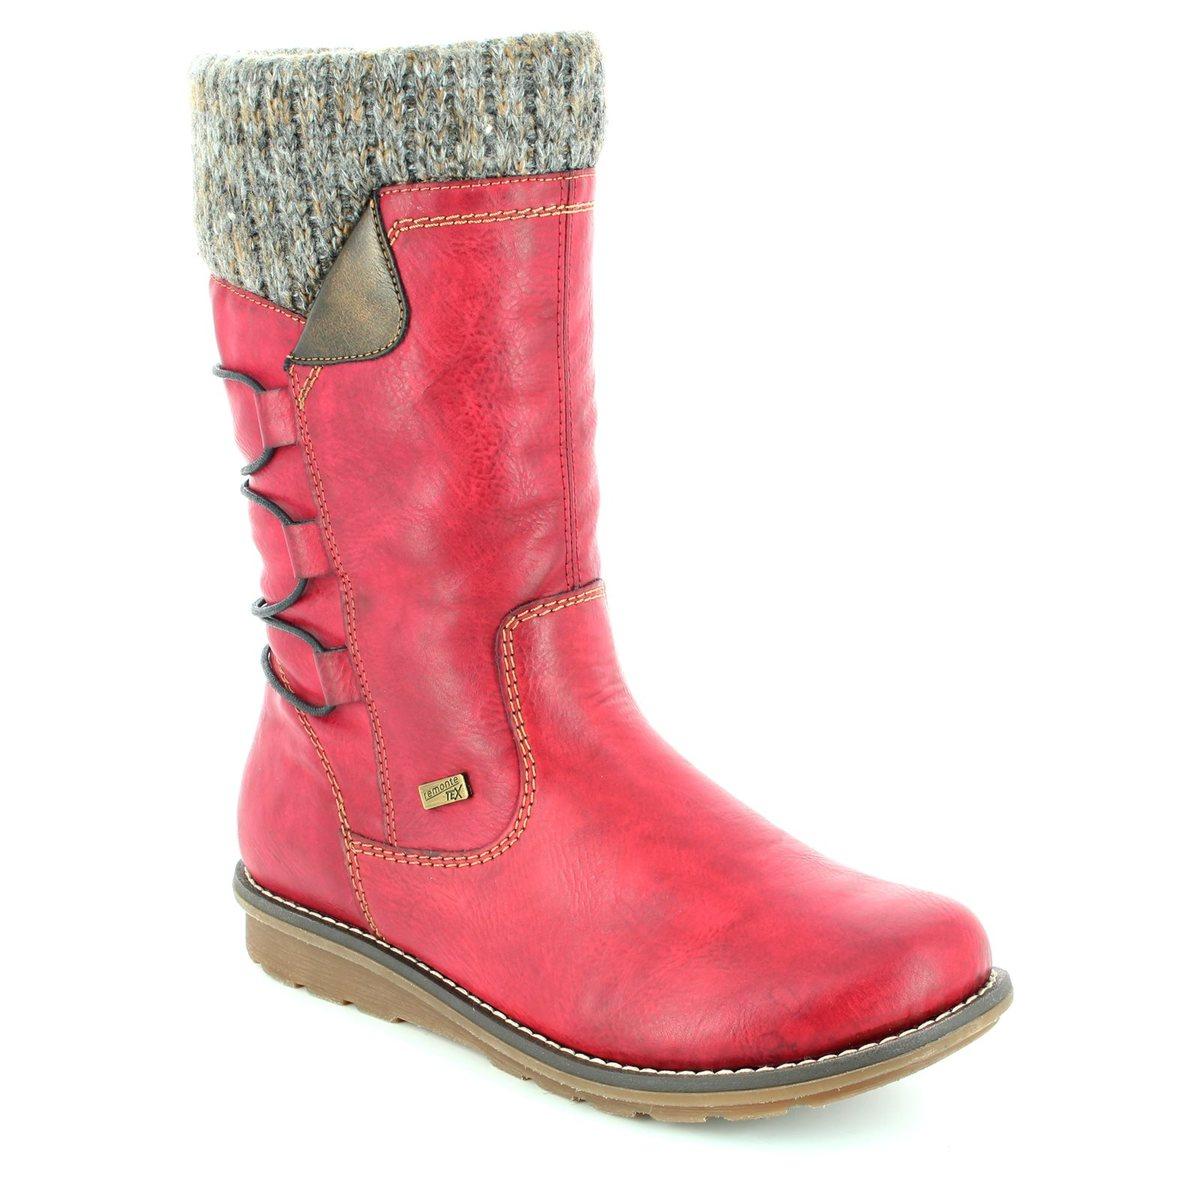 Remonte Boots Womens Remonte PvyeA9